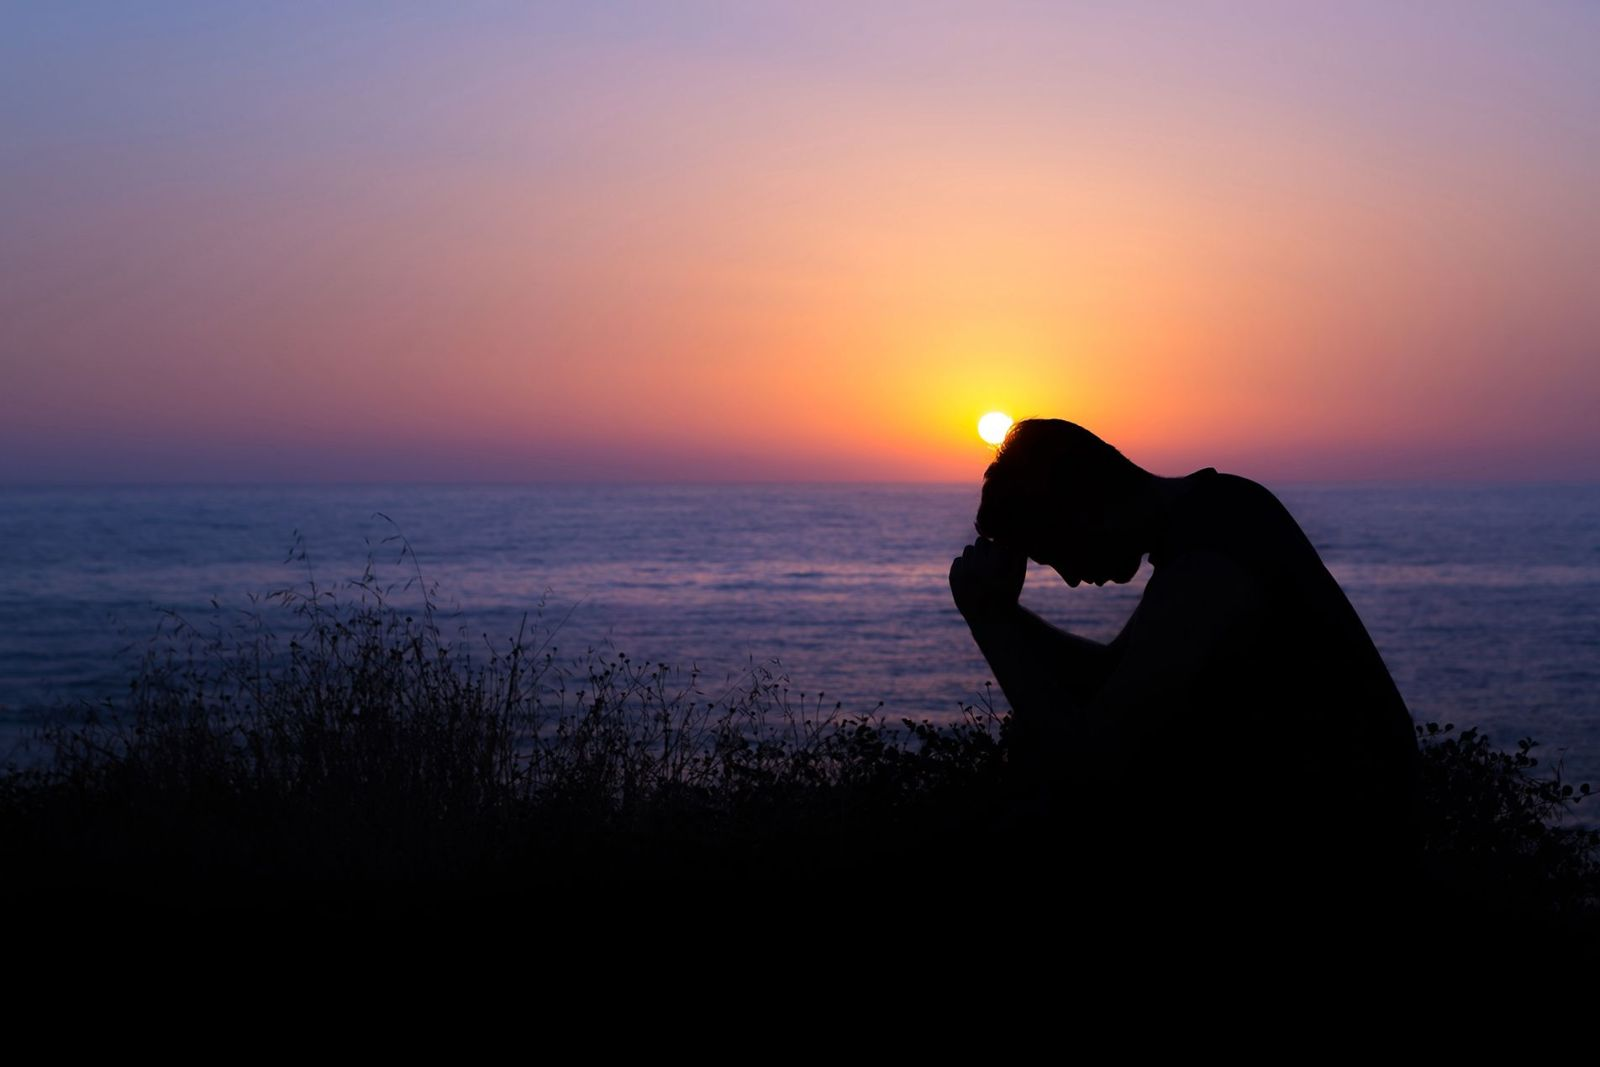 Man prays at sunset